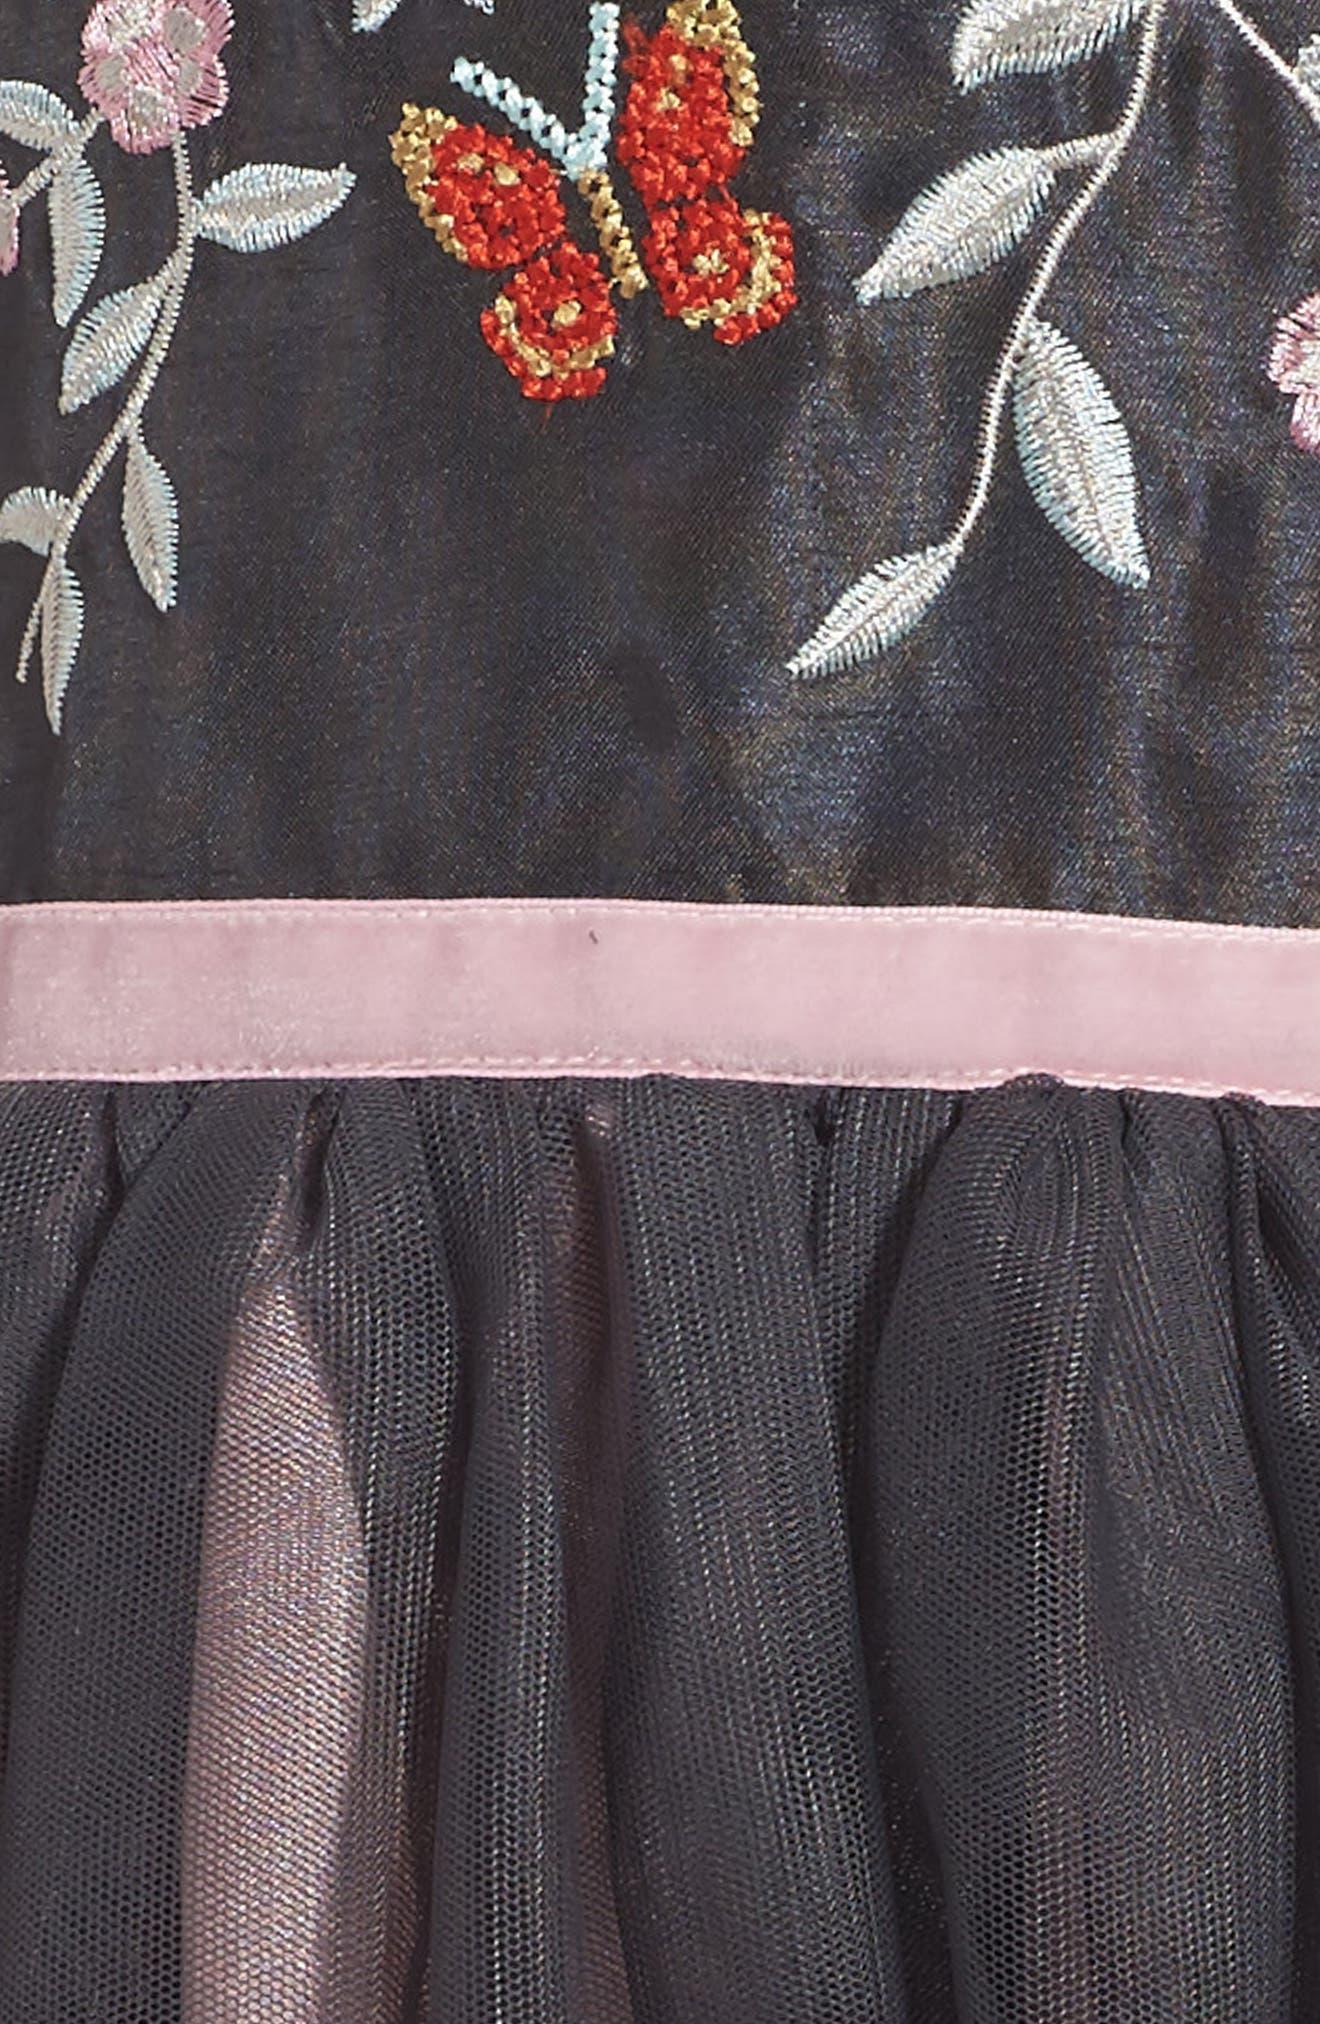 Alternate Image 3  - Zunie Embroidered Fit & Flare Dress (Toddler Girls, Little Girls & Big Girls)